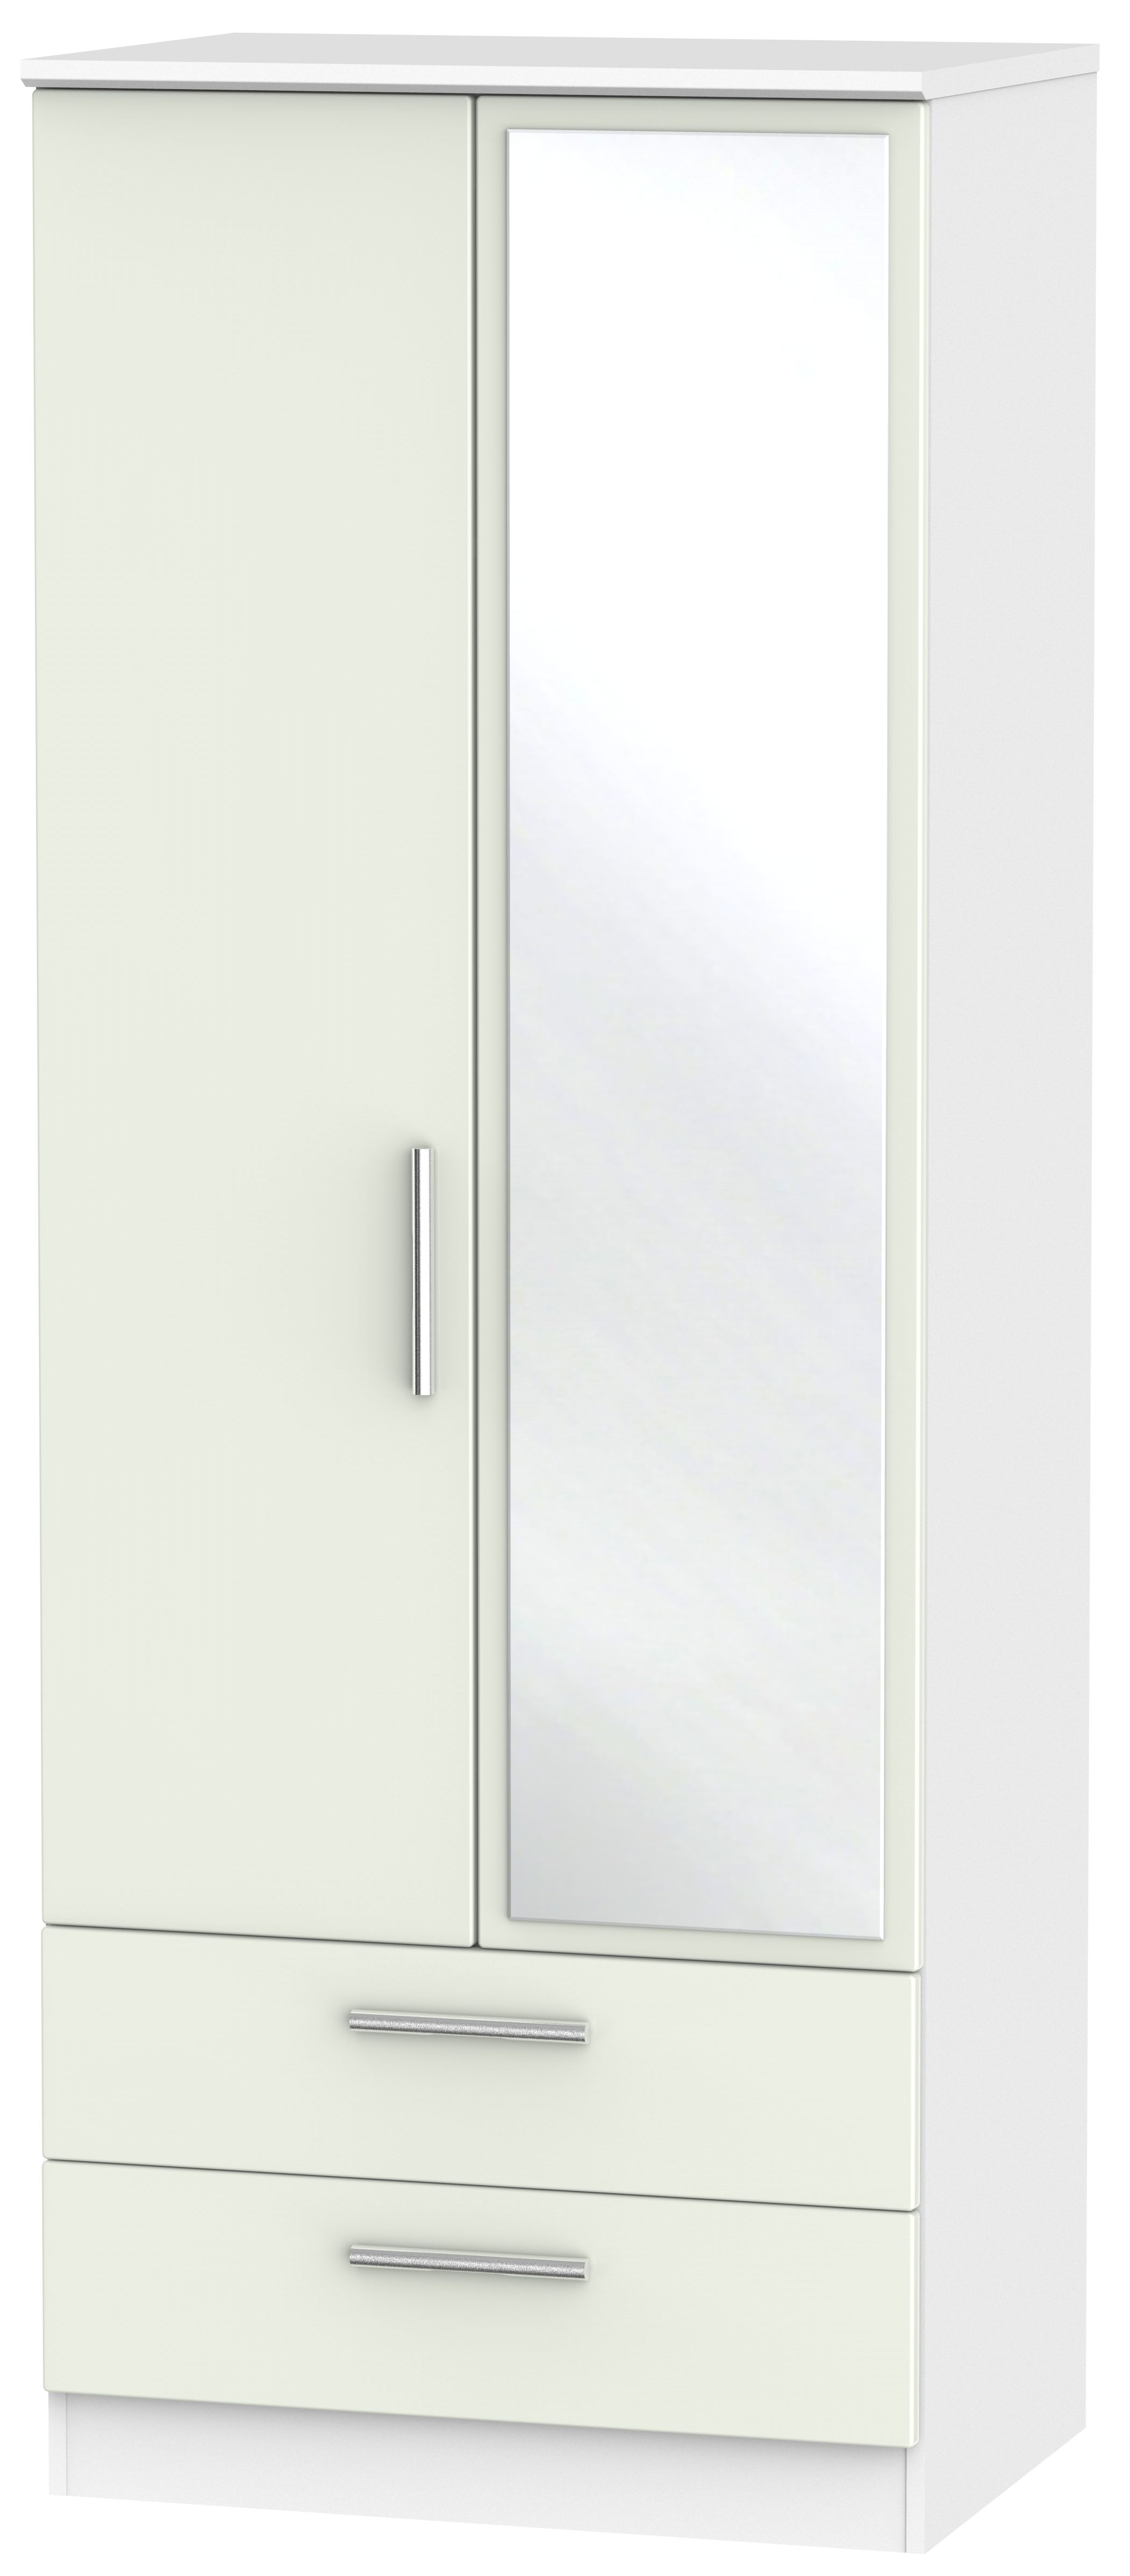 Knightsbridge 2 Door Tall Combi Wardrobe - Kaschmir Matt and White